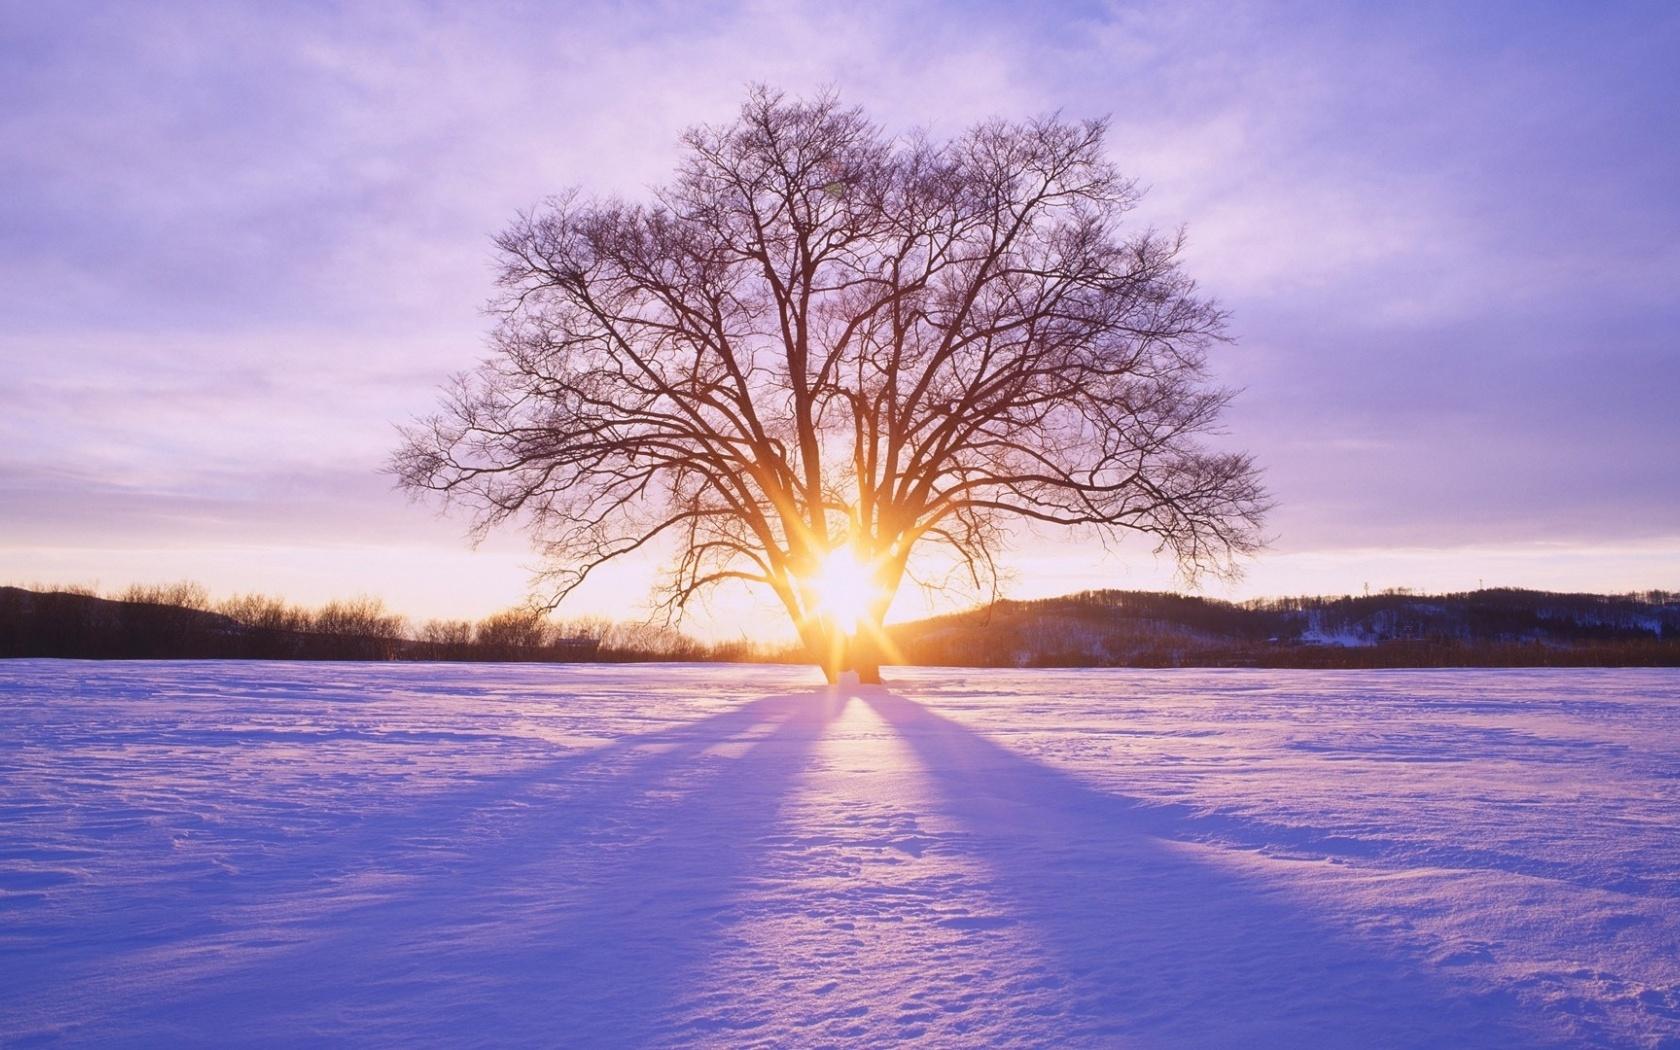 1680x1050 Shiny Sun Tree amp Snow Scenery desktop PC and Mac 1680x1050